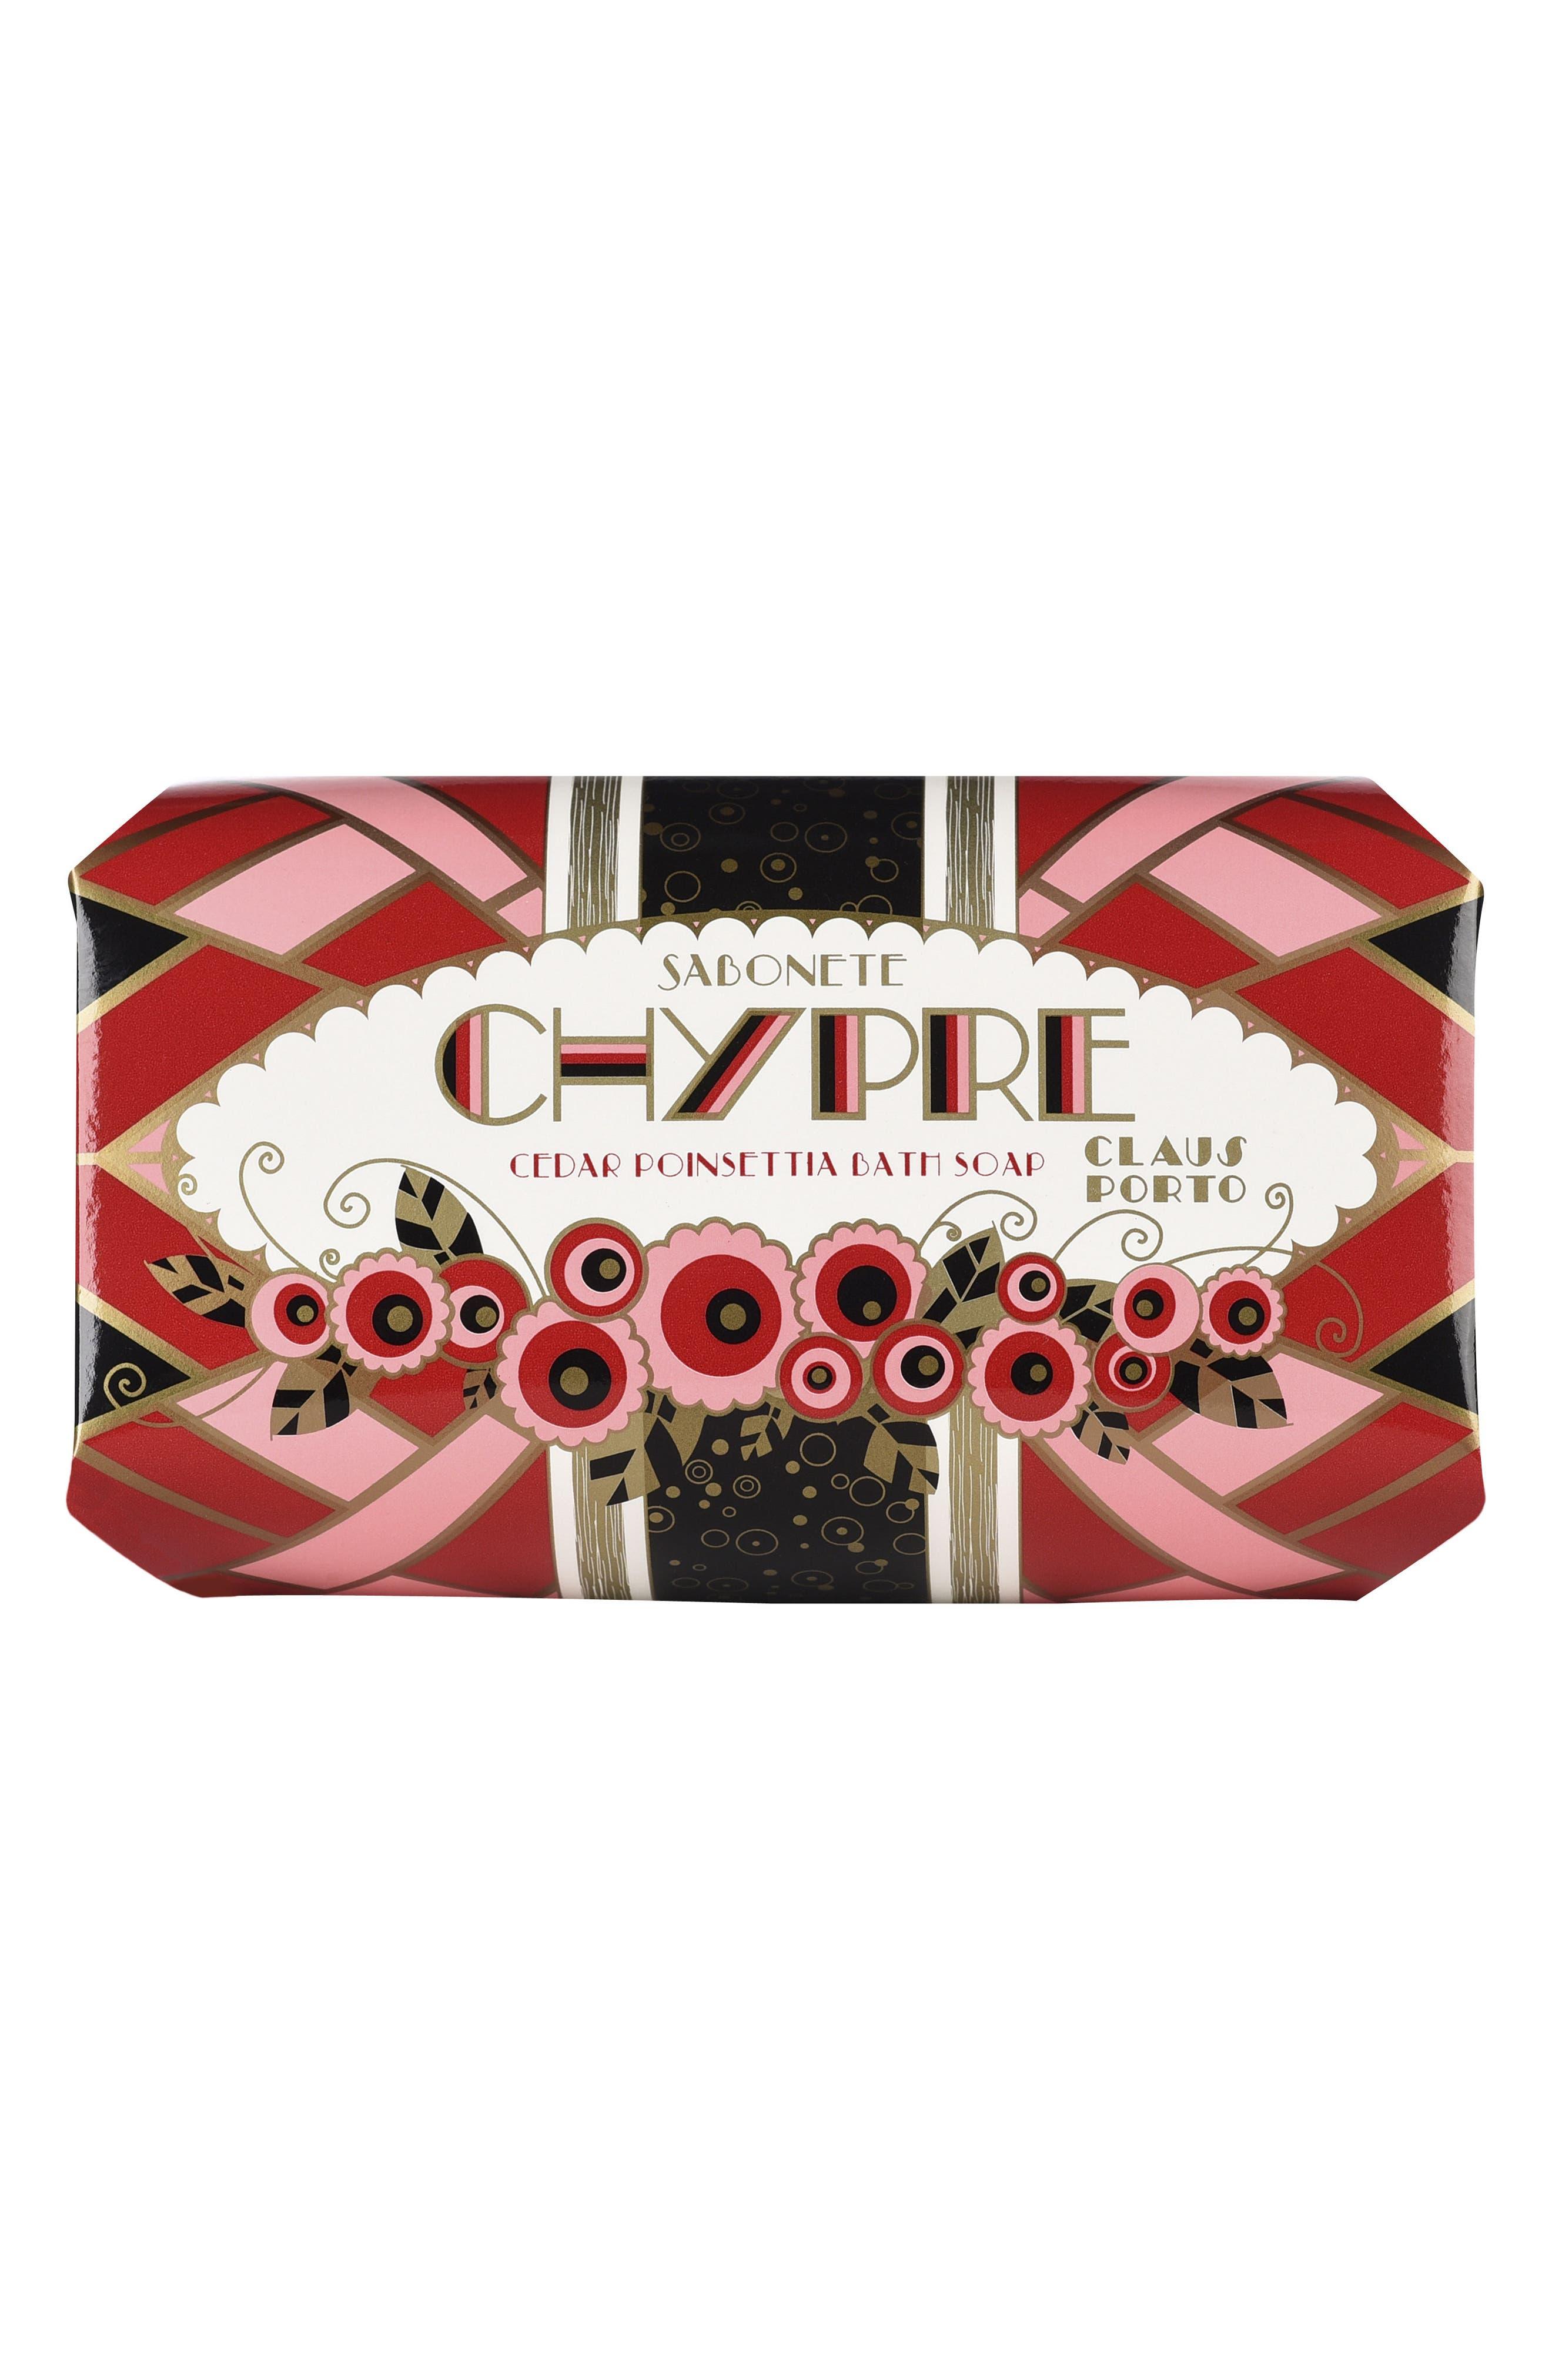 Chypre Cedar Poinsettia Bath Soap,                             Alternate thumbnail 2, color,                             No Color